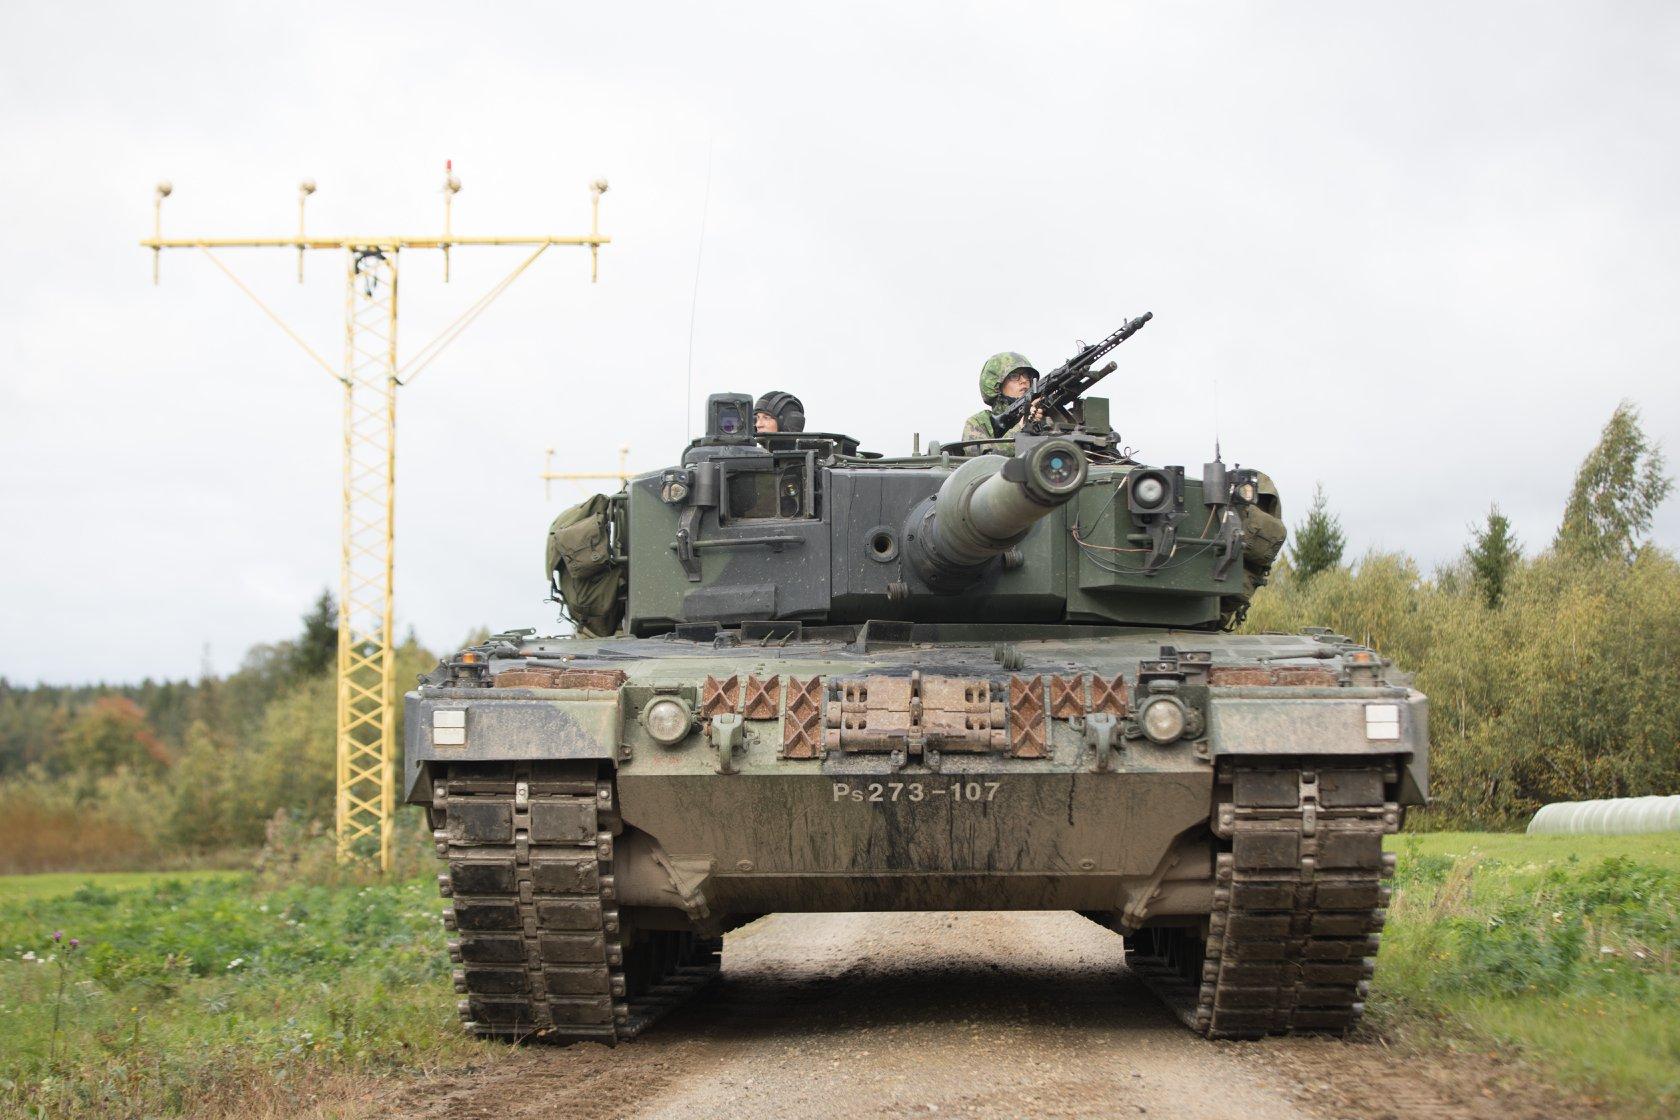 Armée Finlandaise / Finnish Defence Forces / puolustusvoimat - Page 10 41550876_1967725669917479_2381702671510798336_o-jpg